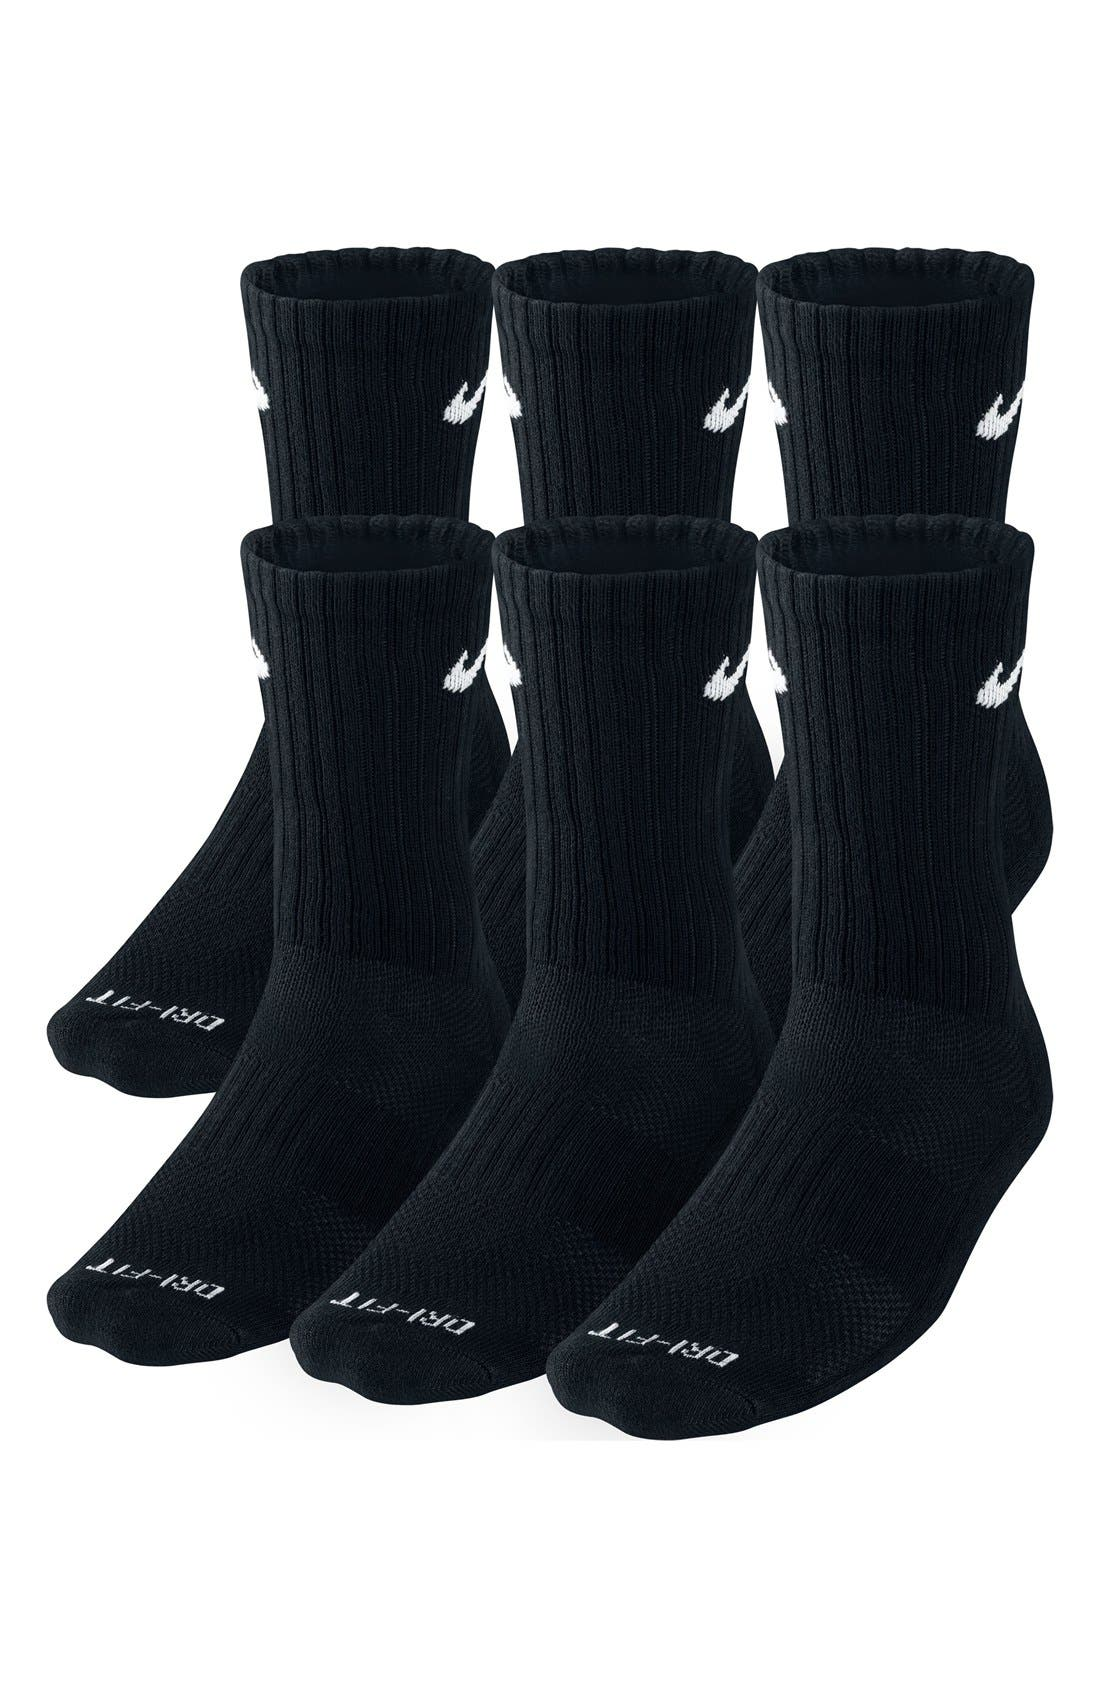 Dri-FIT Crew Socks,                         Main,                         color, 001